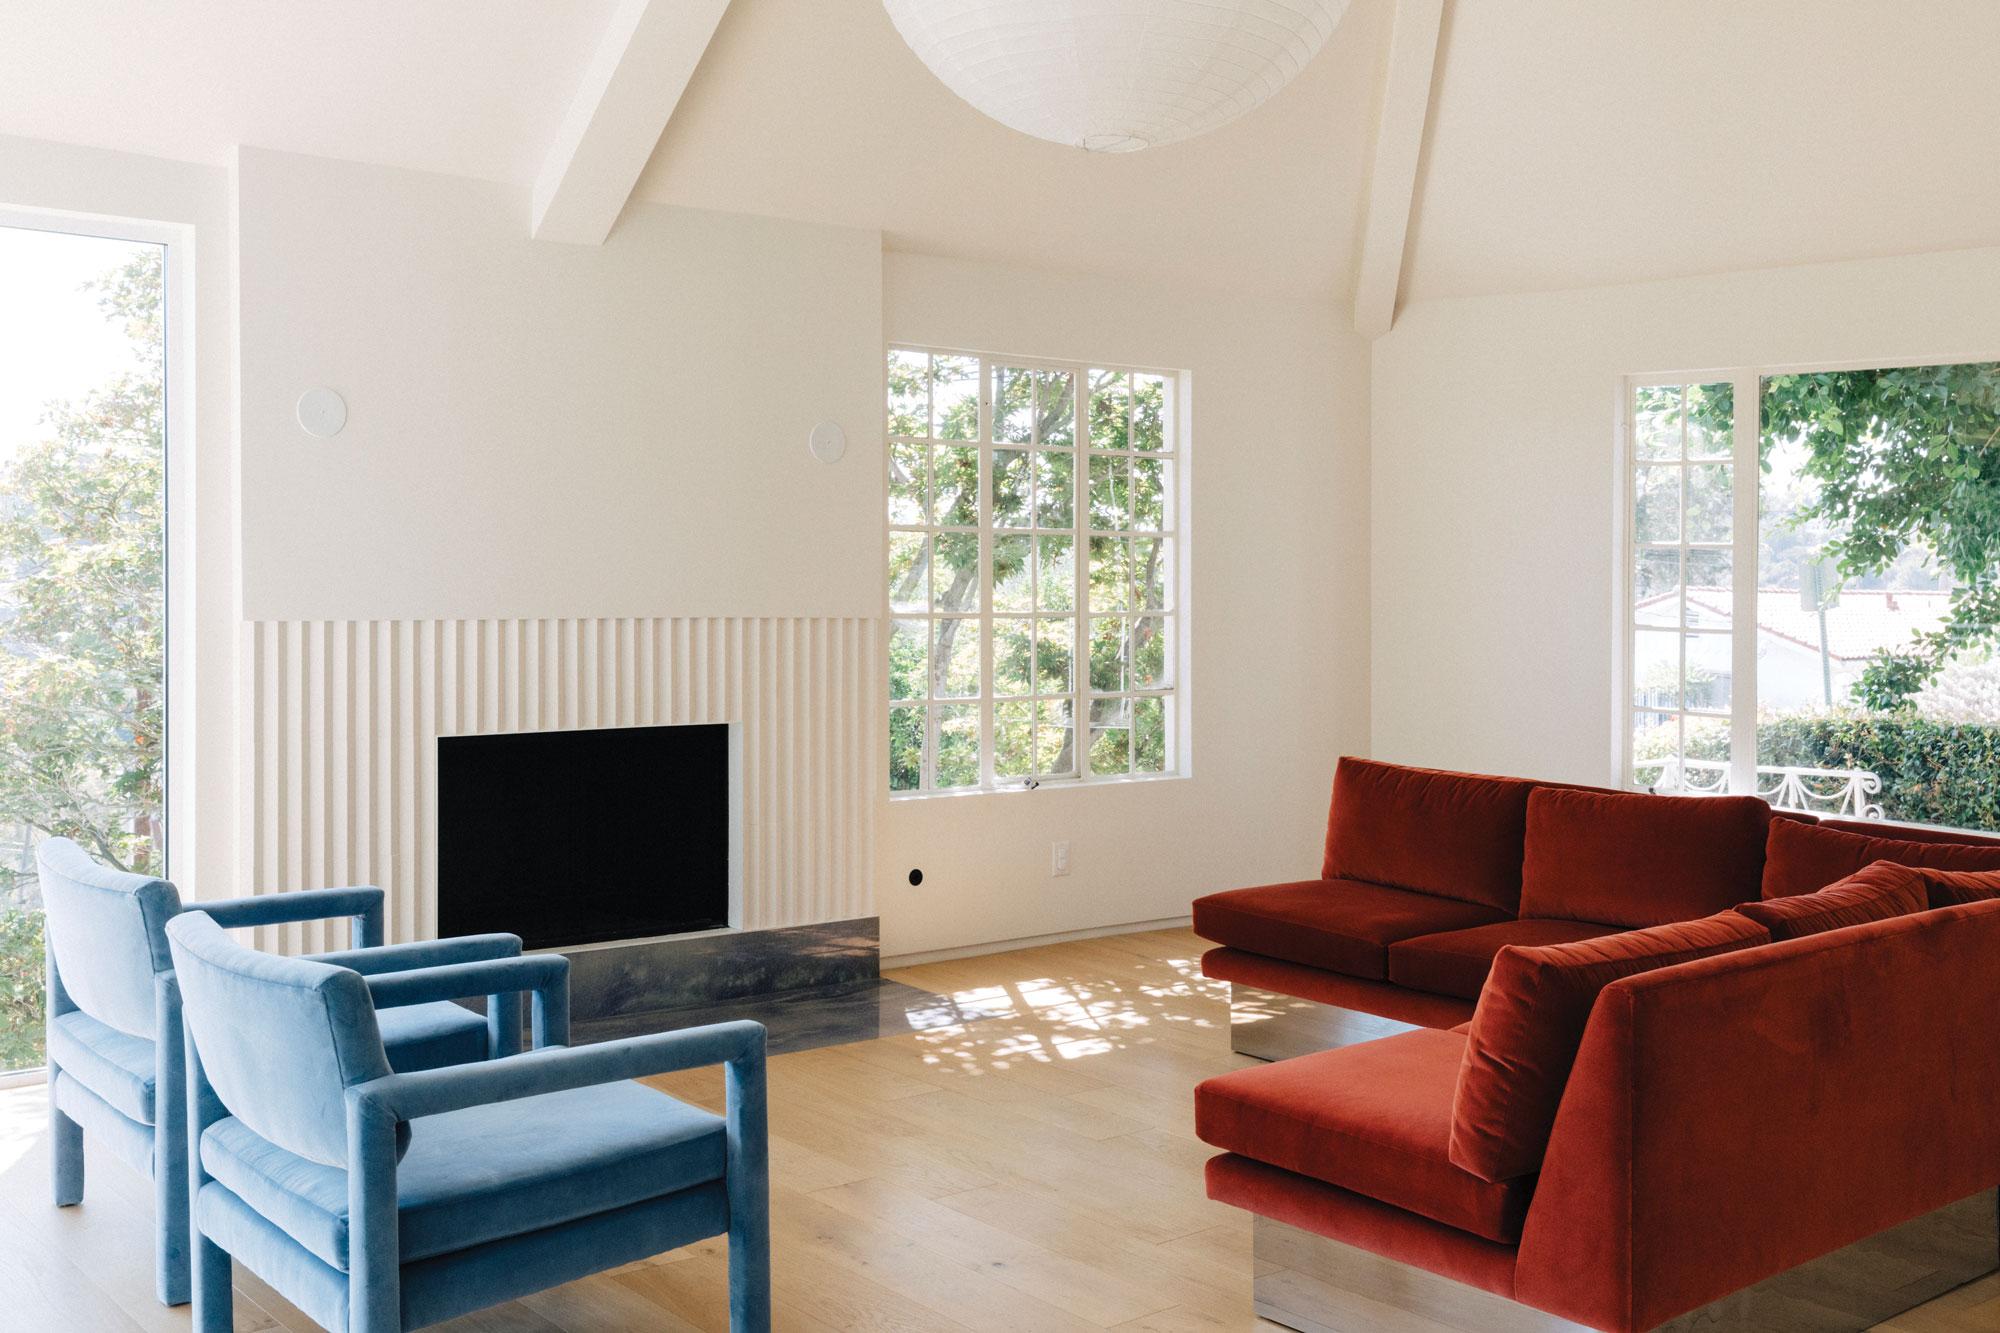 sixtysix roanne adams home decor